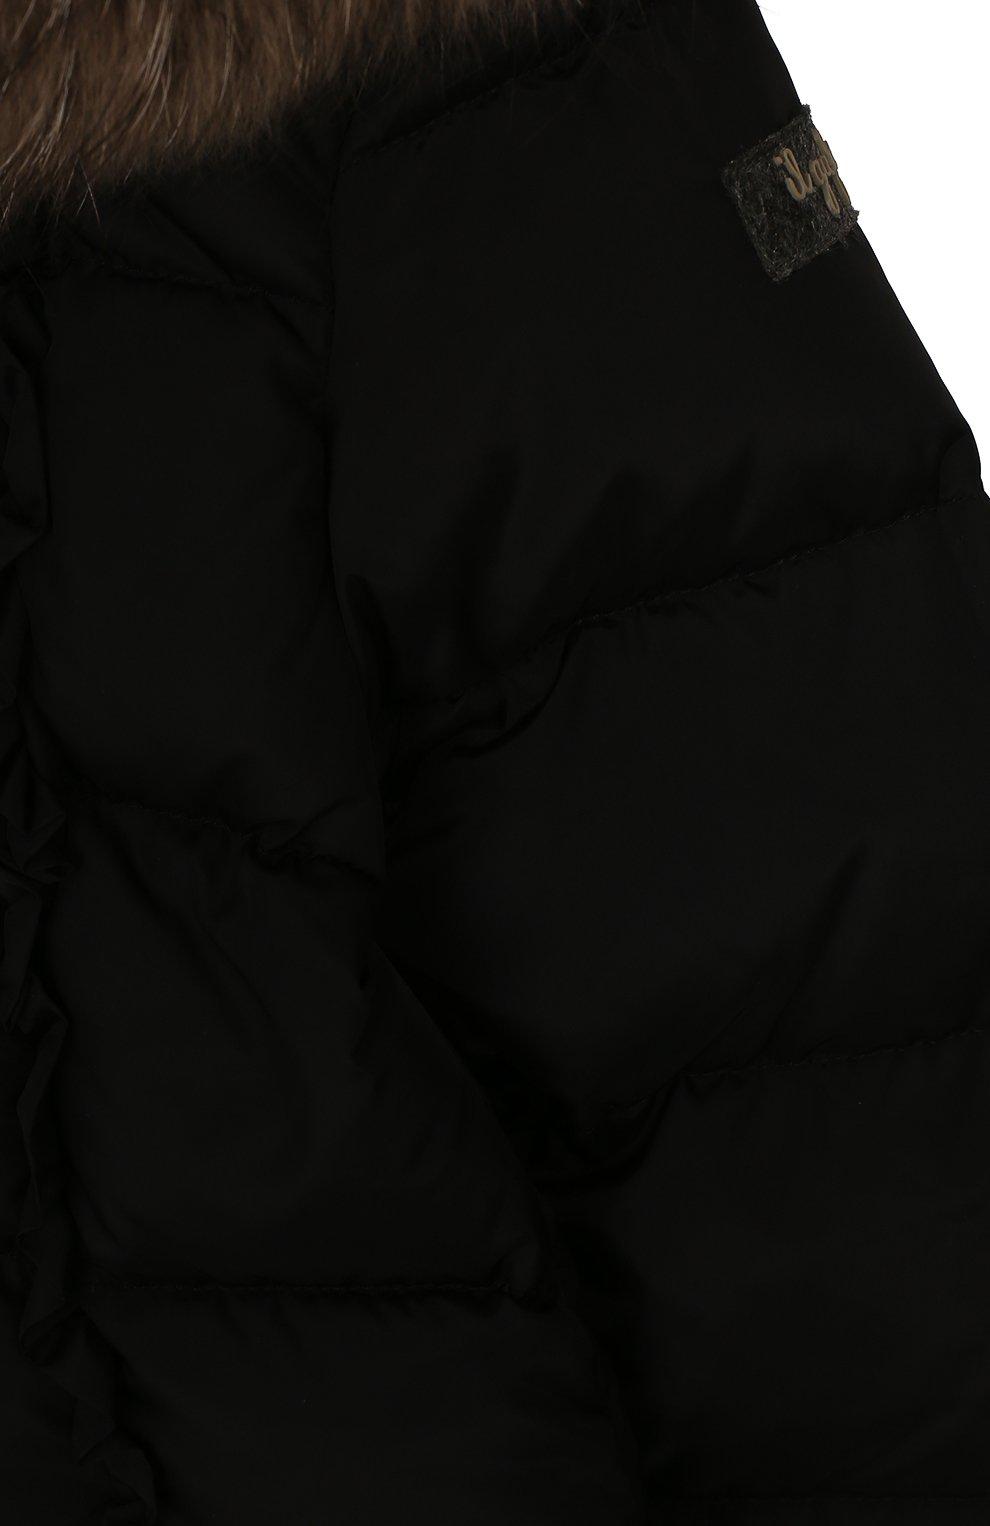 Пуховик с капюшоном | Фото №3